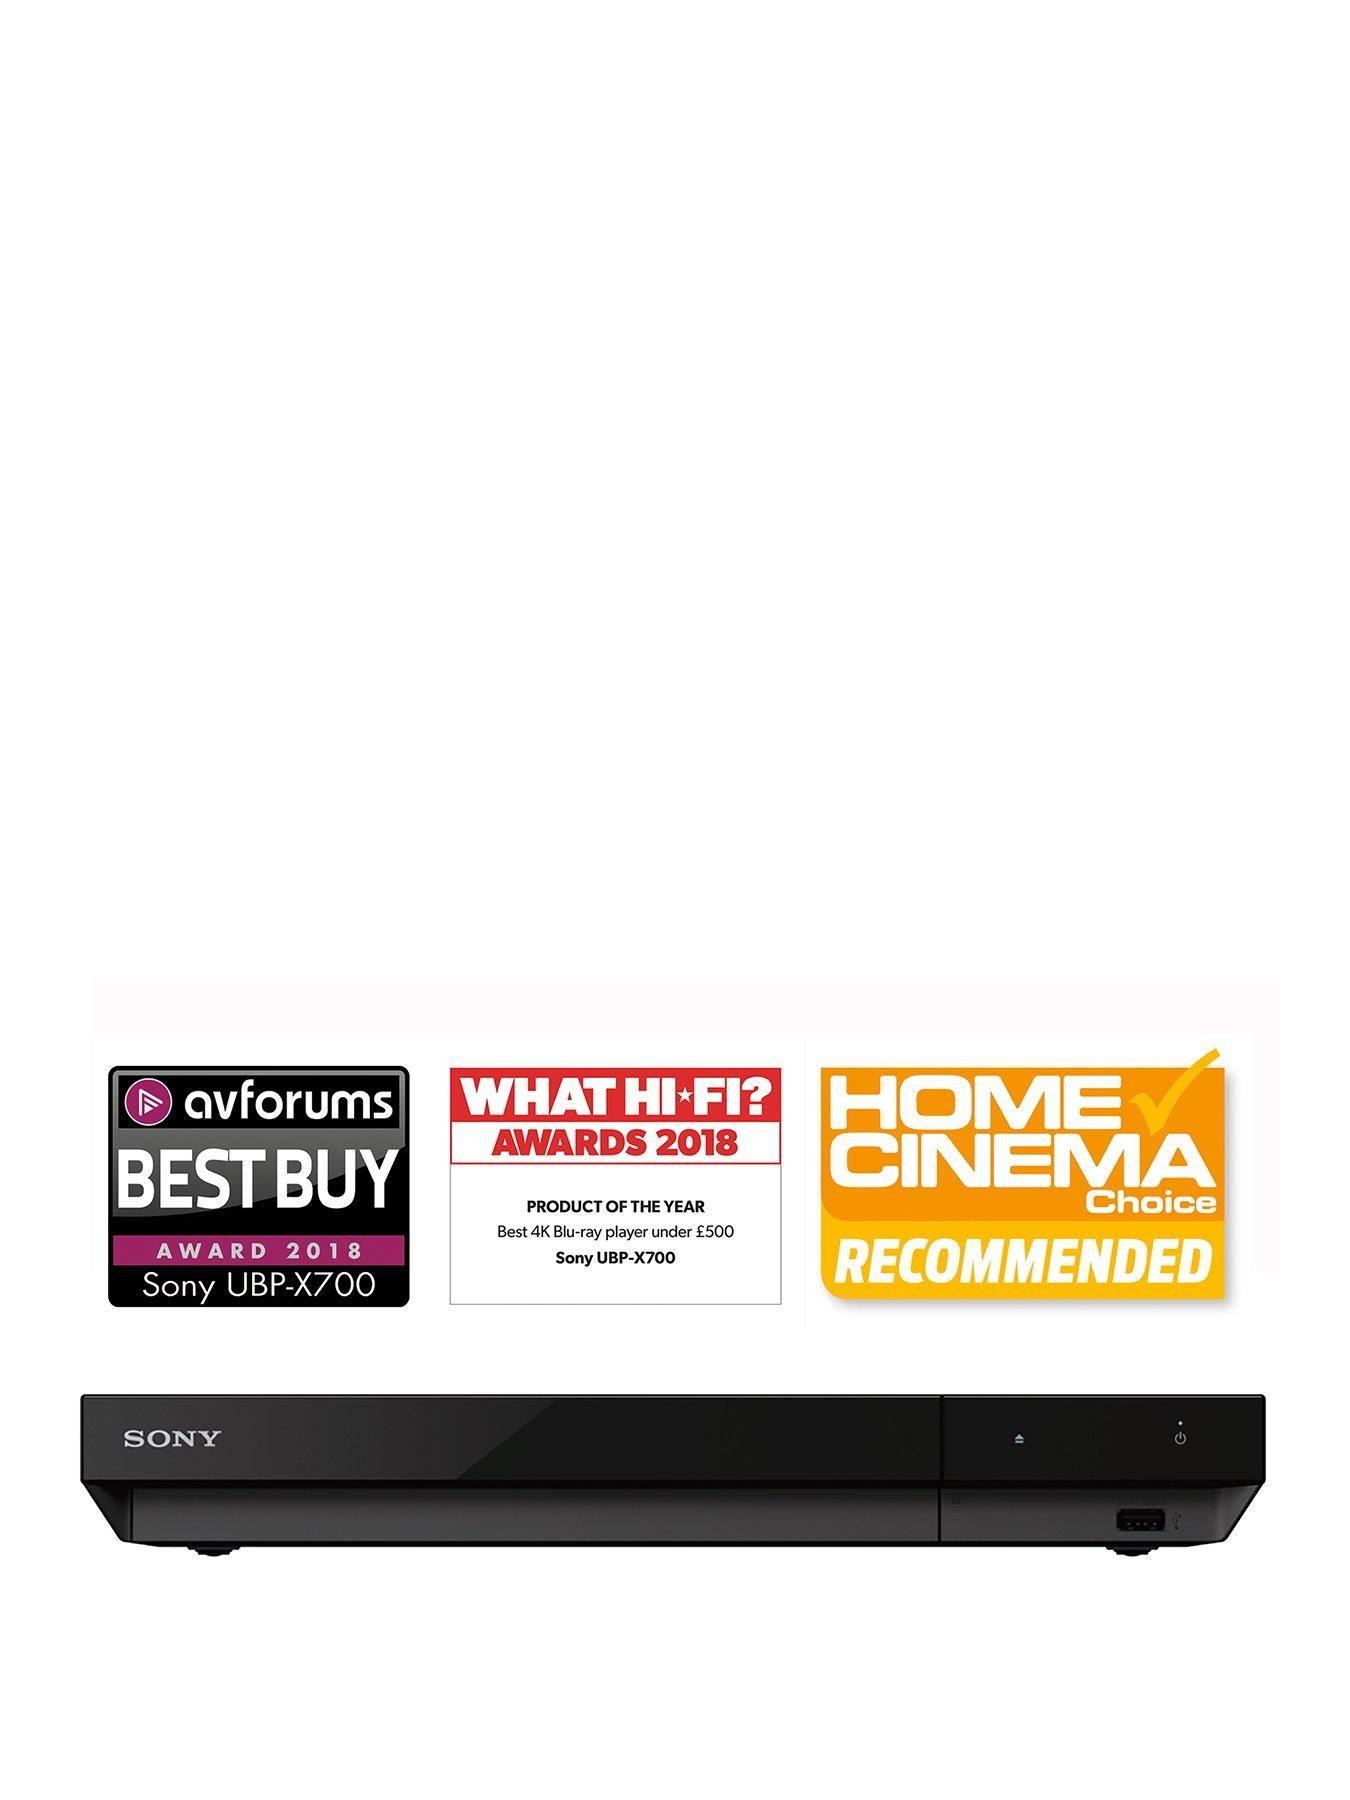 Sony Ubp X700 4k Ultra Hd Blu Ray Player Black Black Dolby